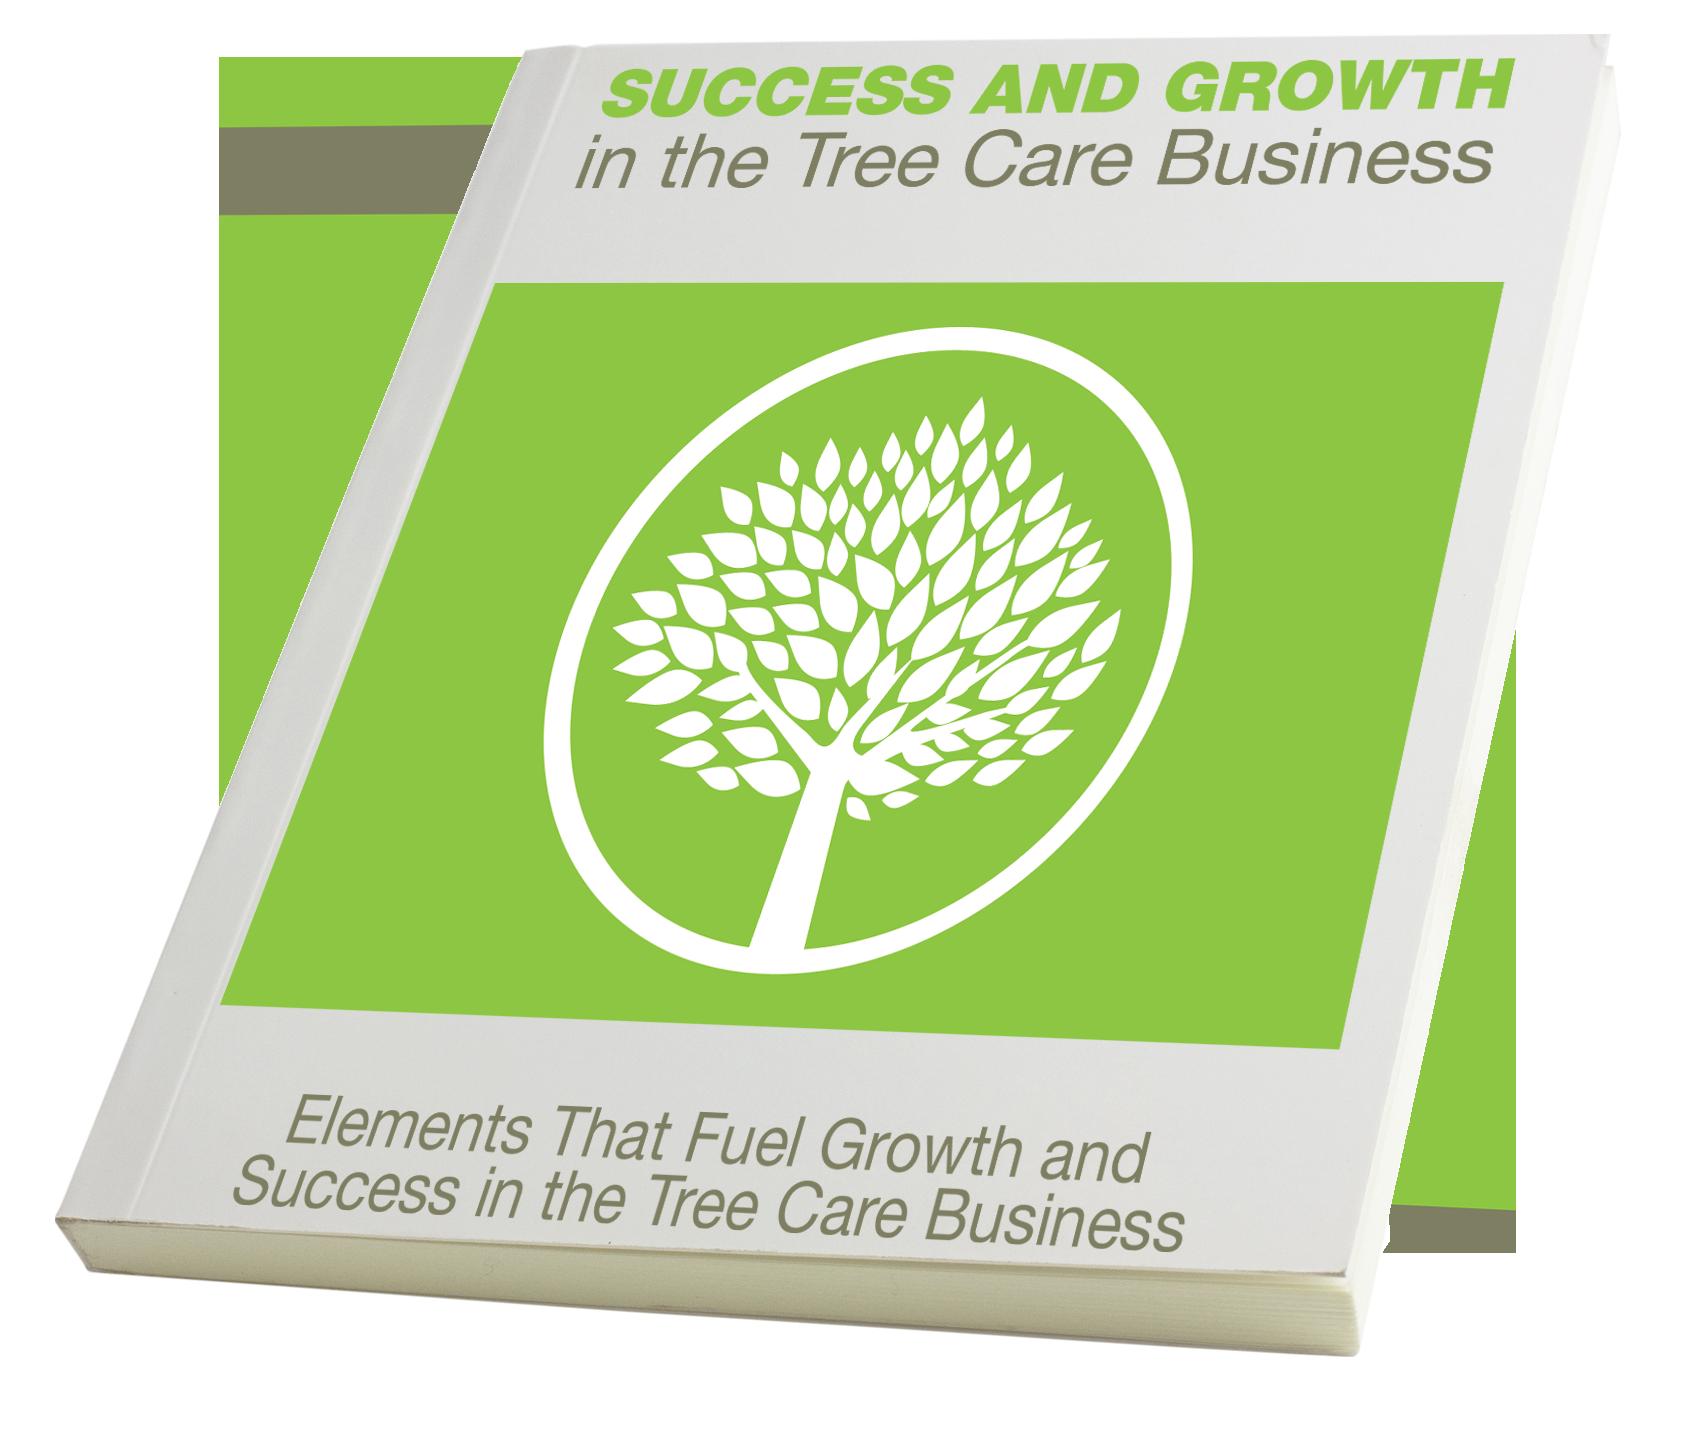 Tree service marketing success